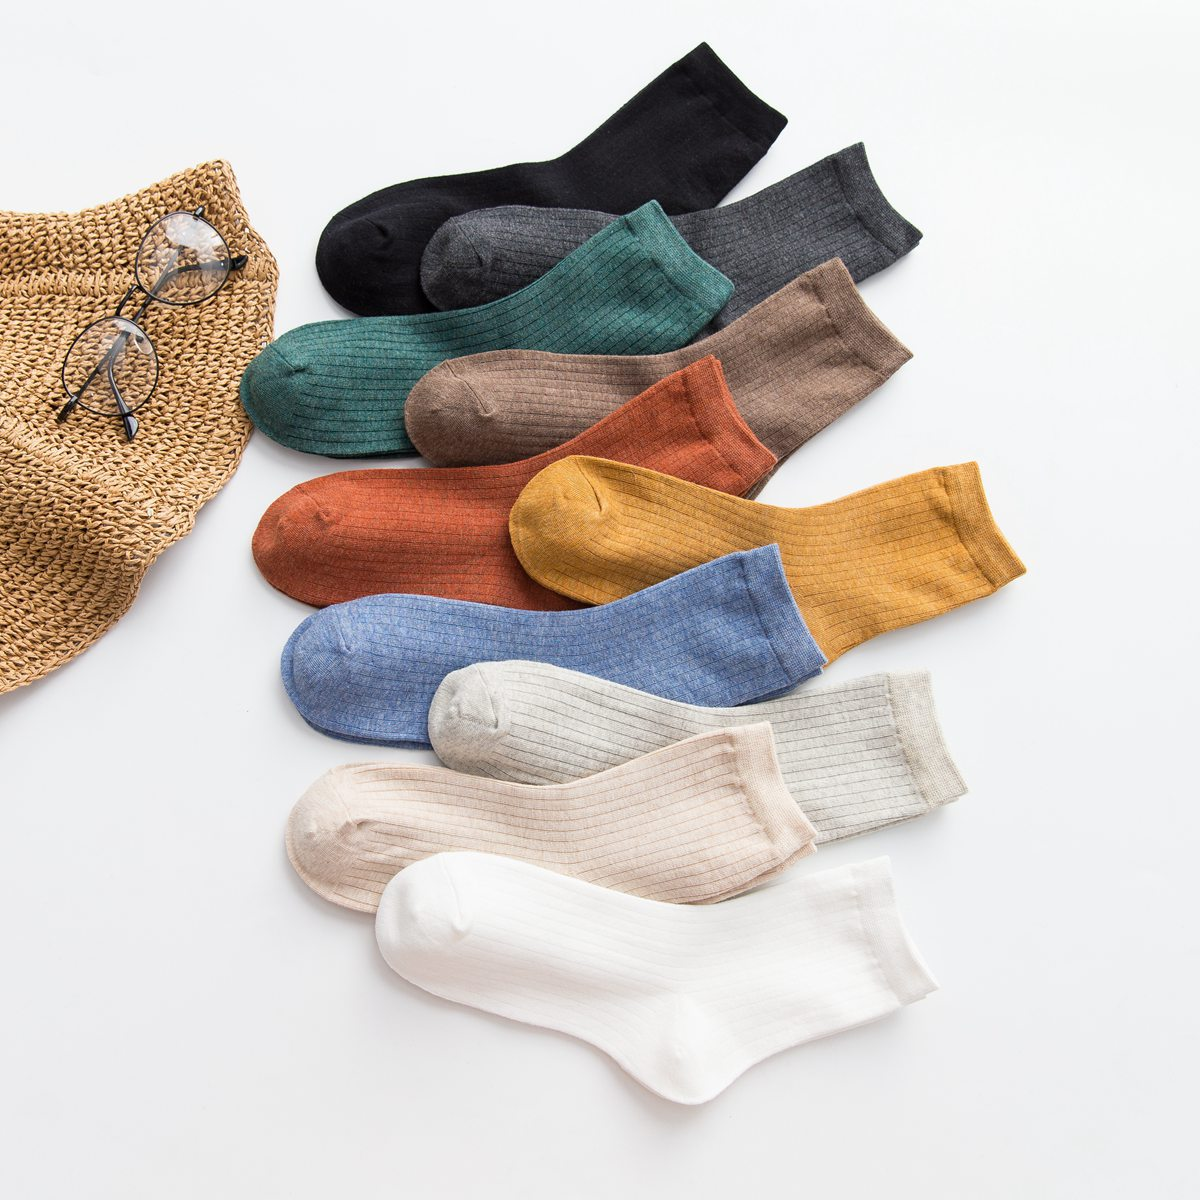 Cotton female tube socks pure color brand double-needle Japanese female socks cotton manufacturers socks wholesale a generation